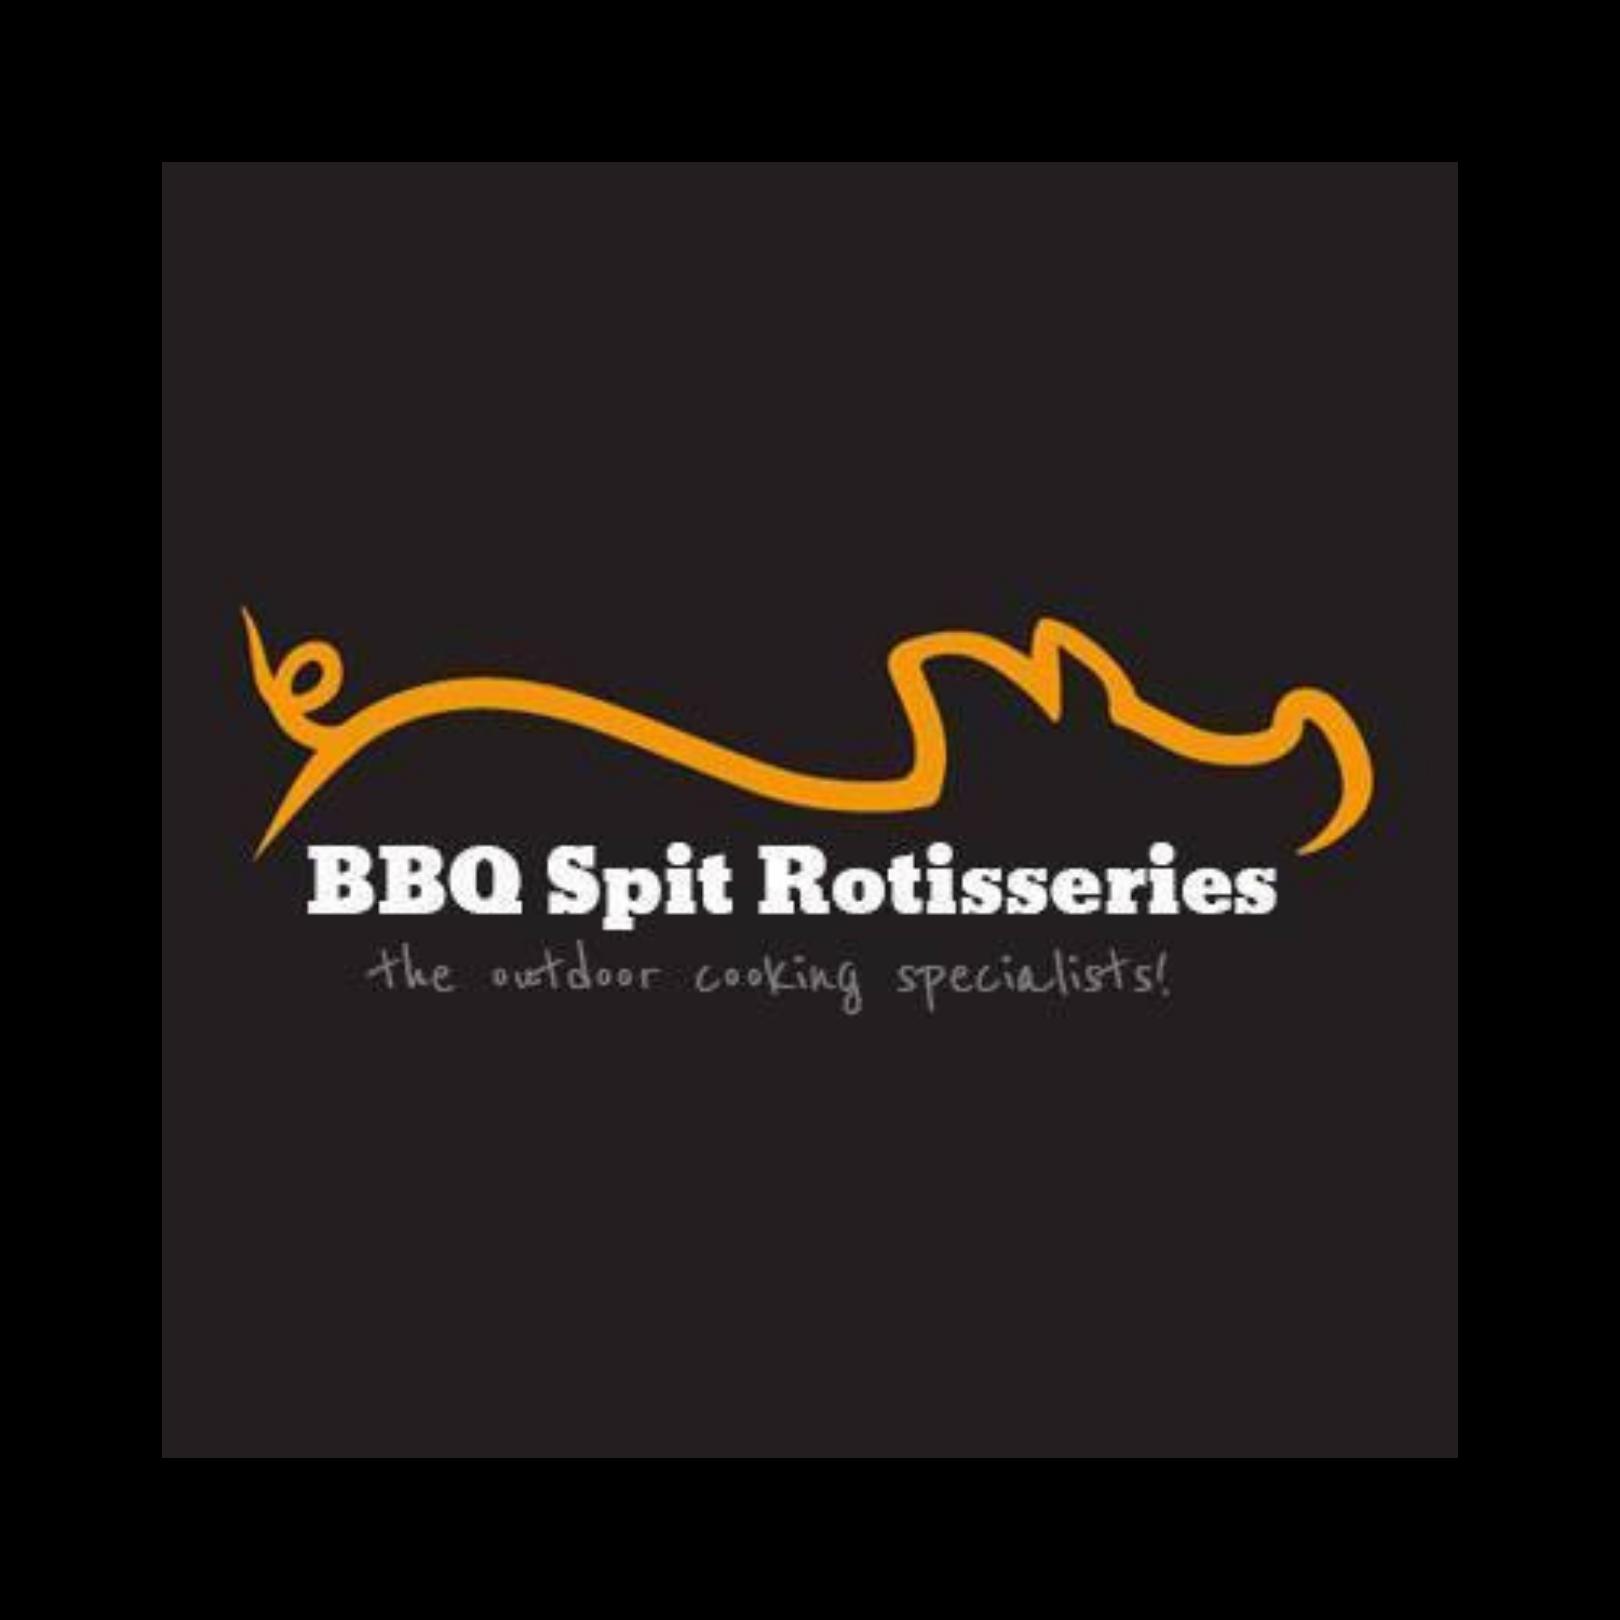 BBQ Spit Rotisseries